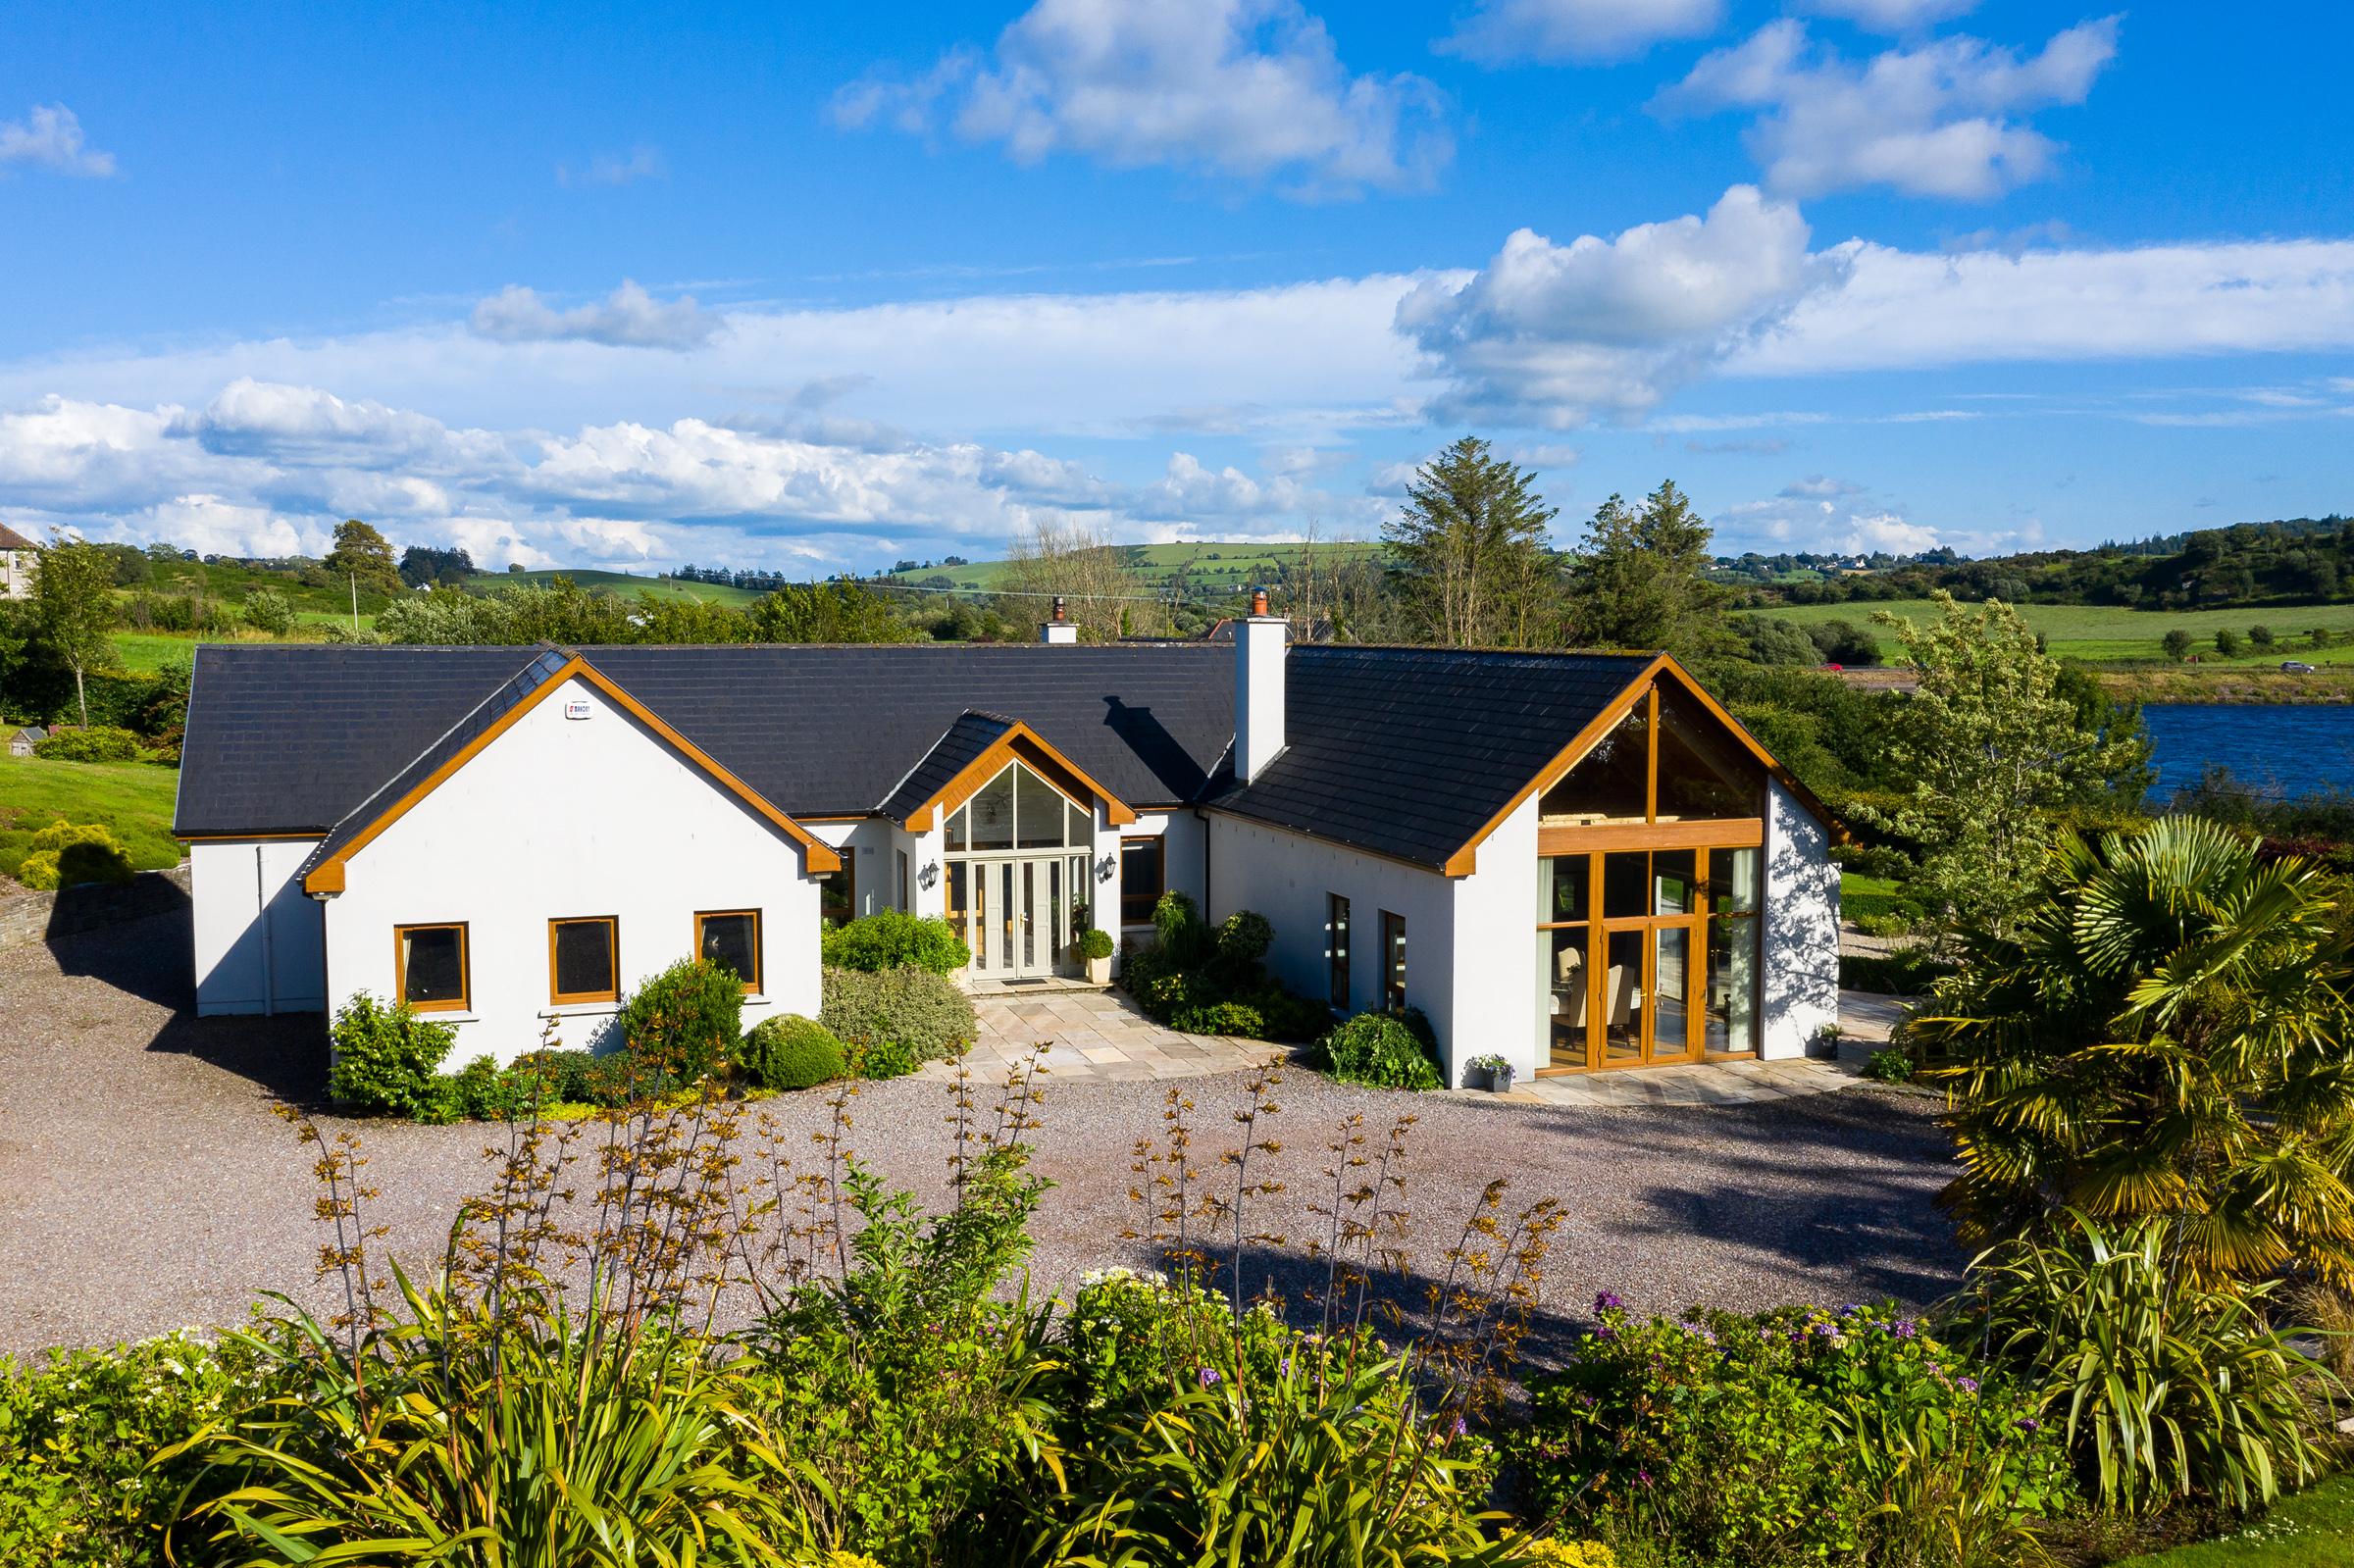 LAKE VIEW, Ballytrasna, Lissarda, County Cork.